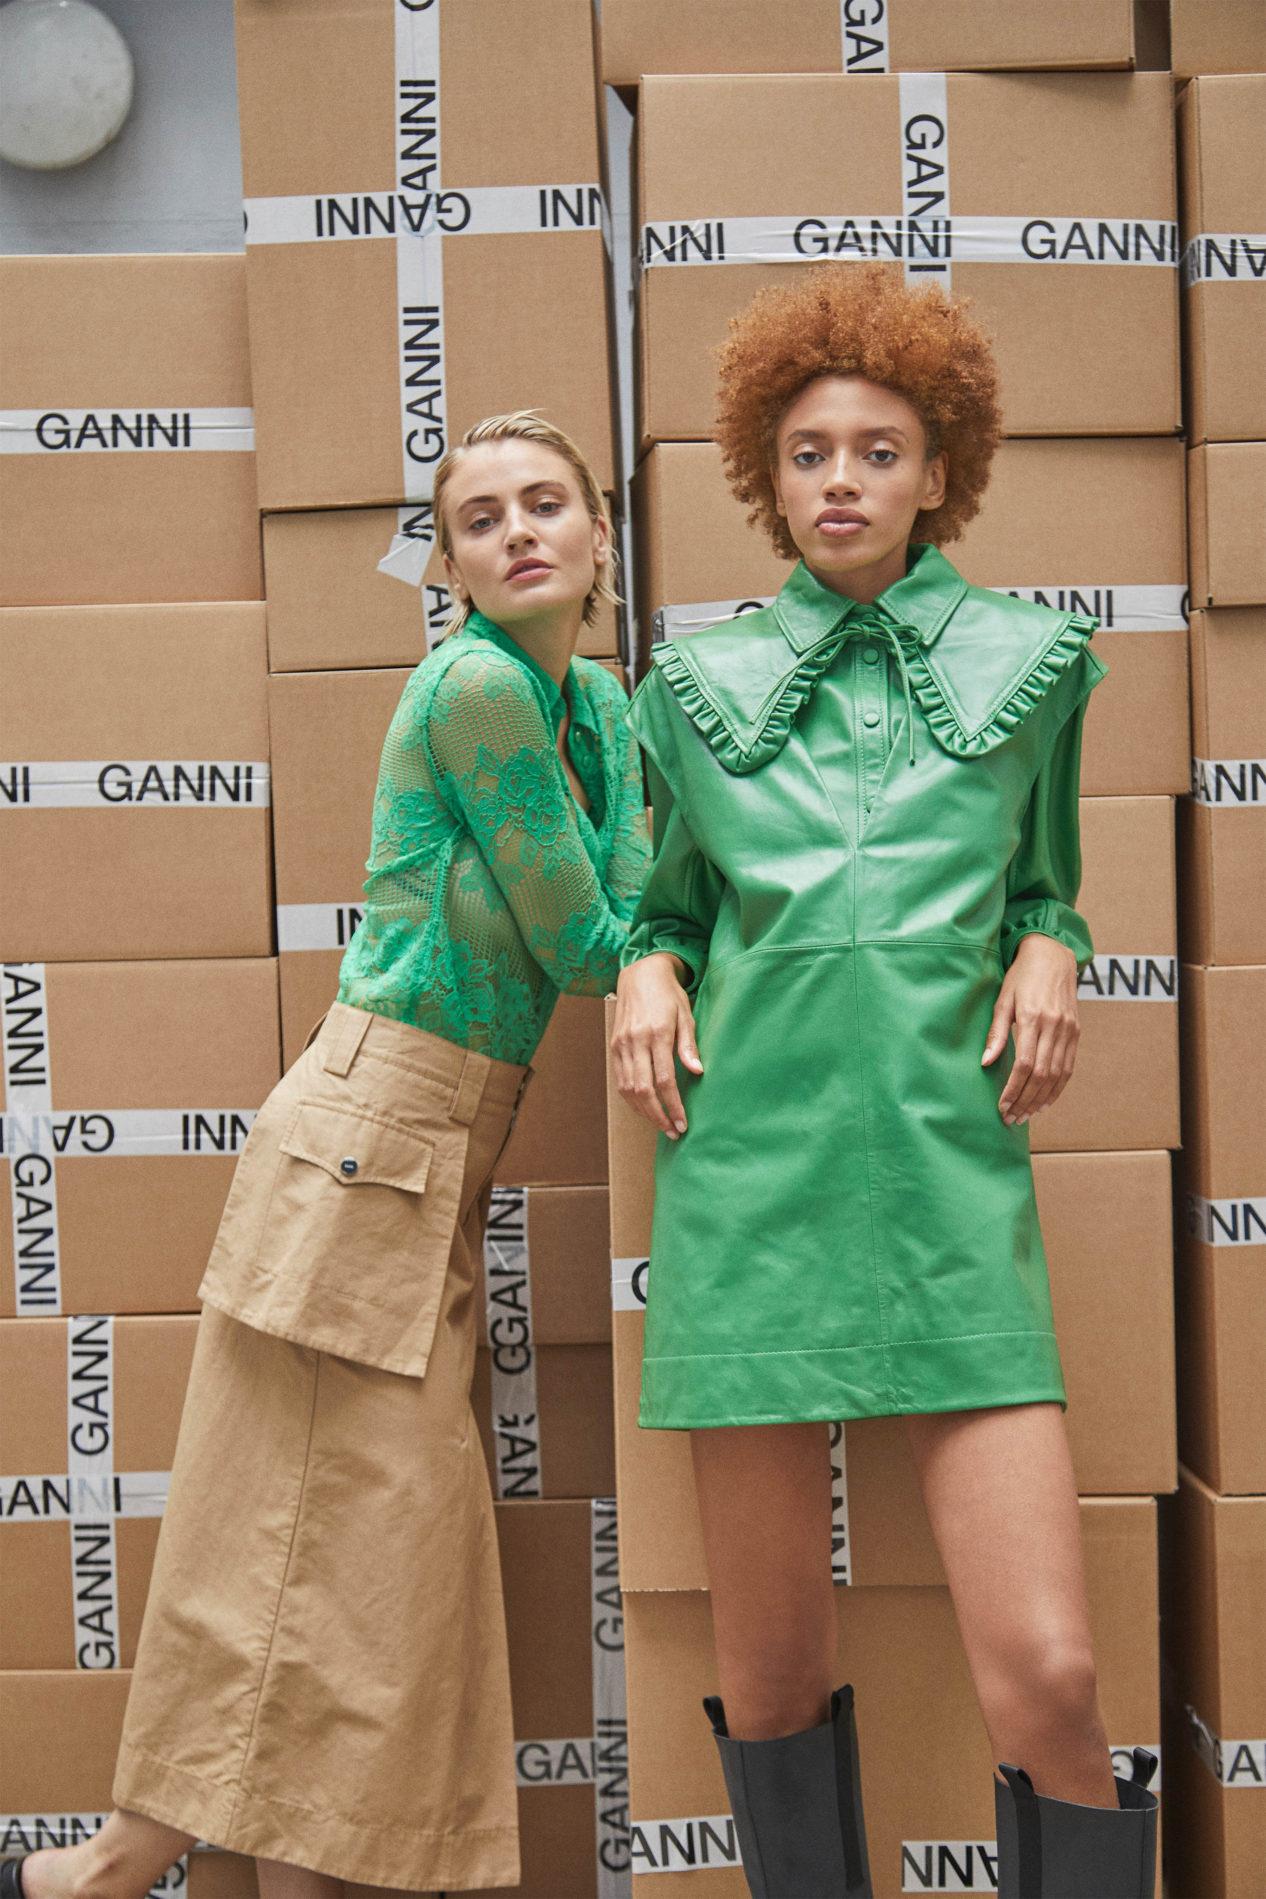 Ментоловый образ от Ganni Ready To Wear весна-лето 2021